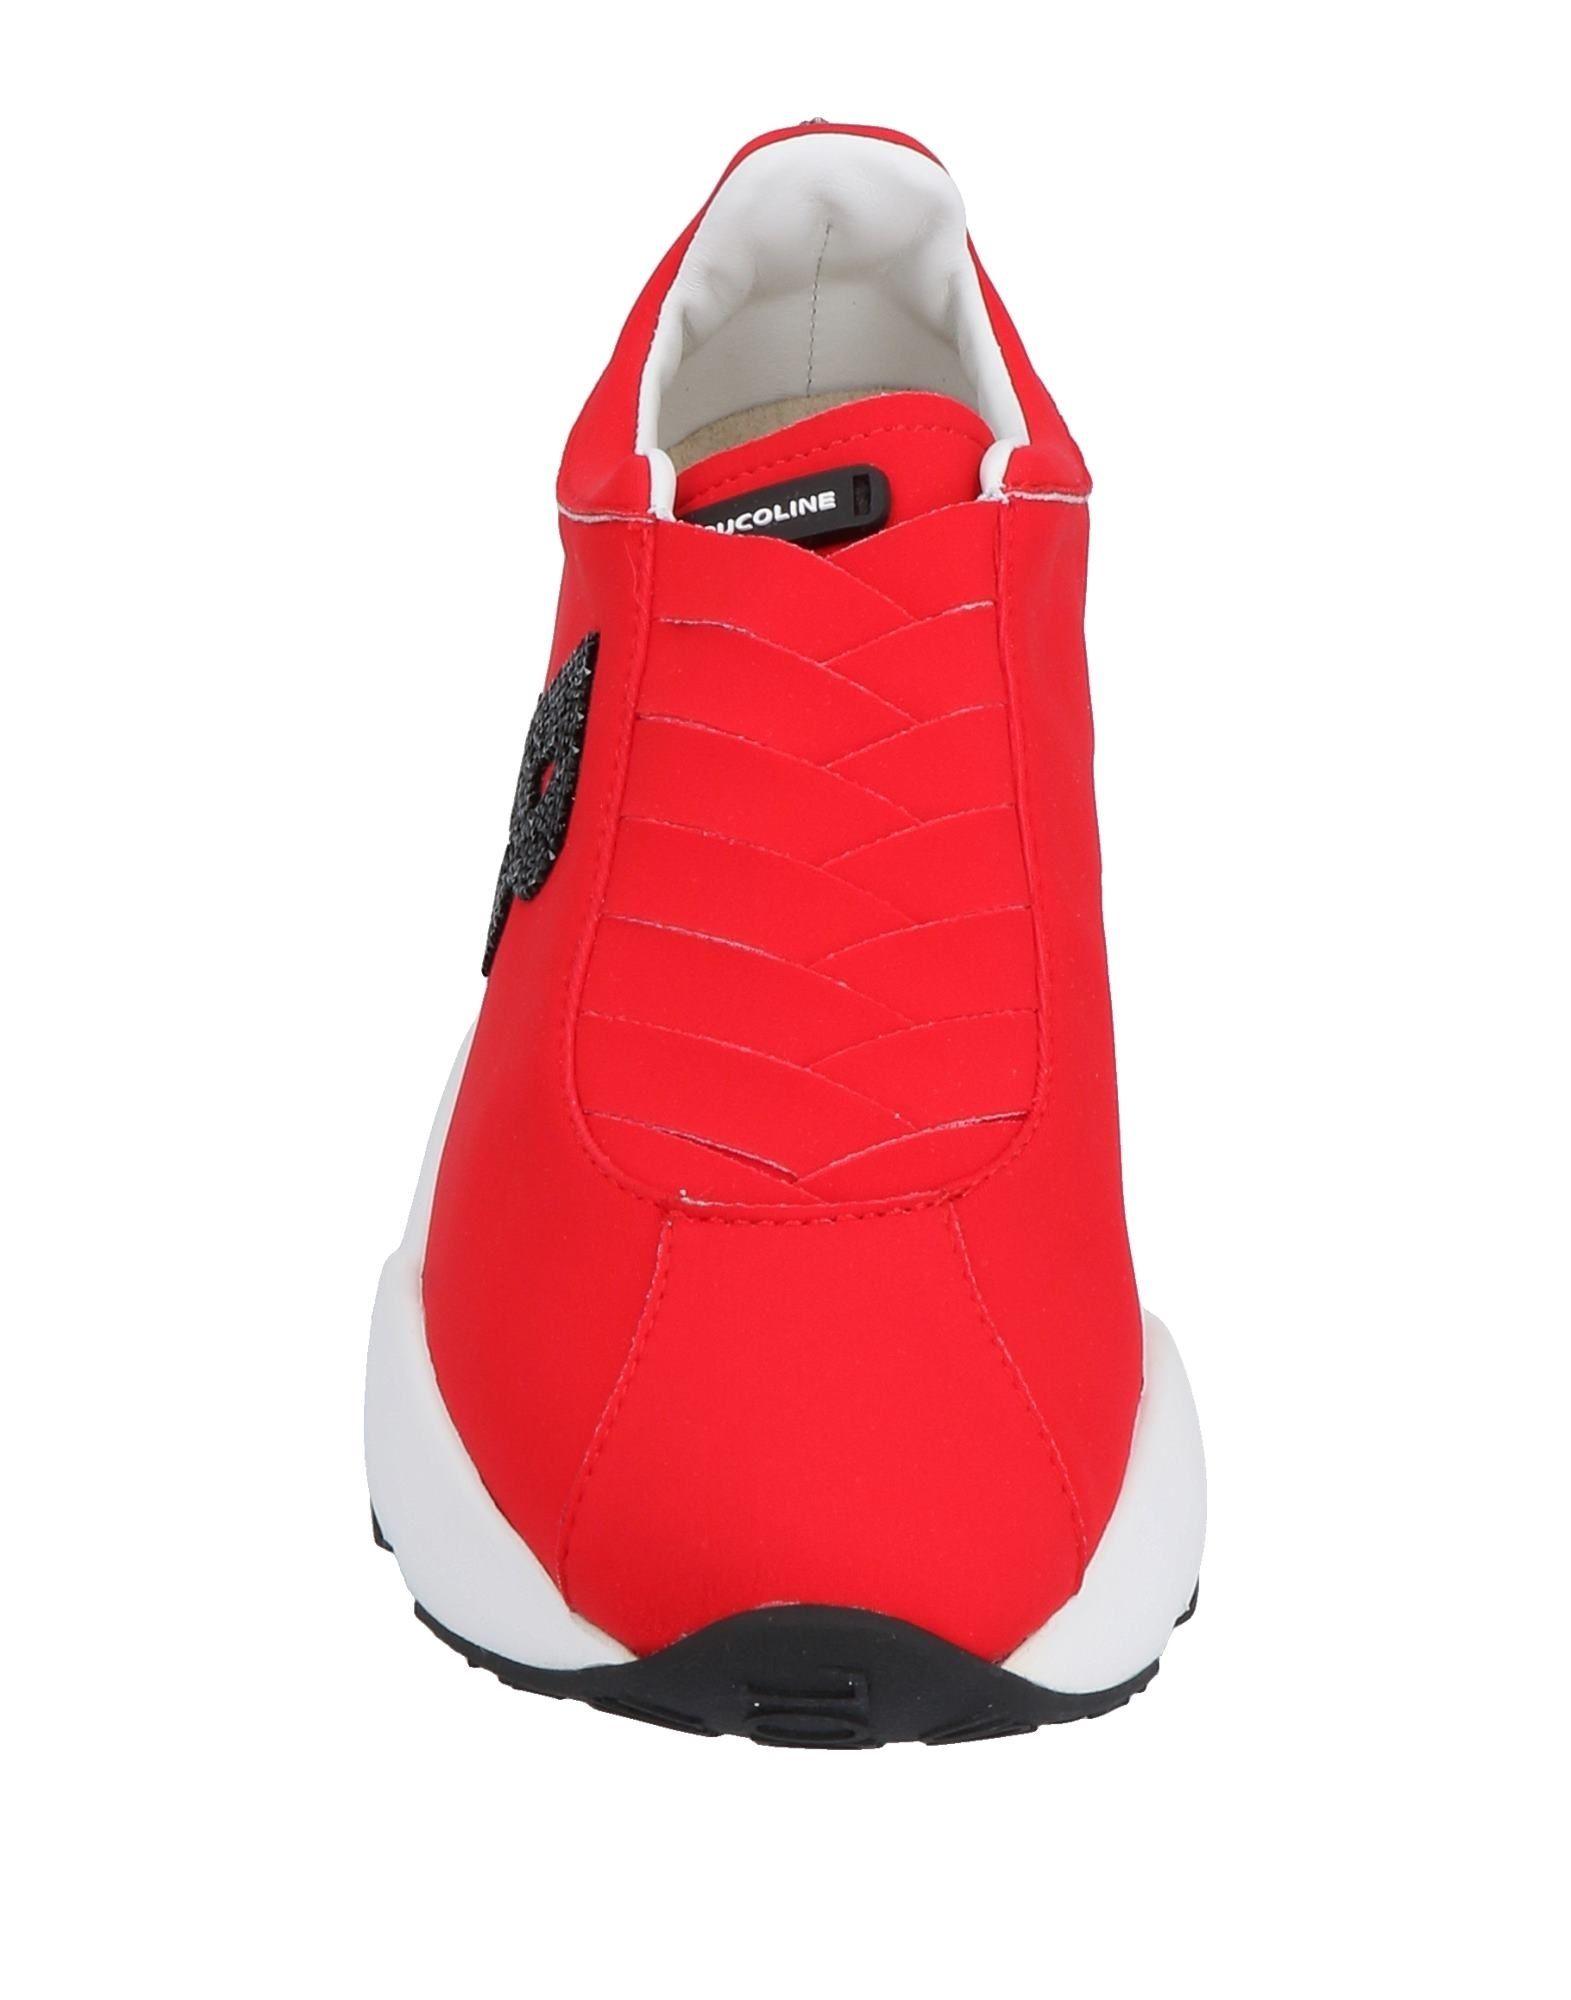 Stilvolle billige Schuhe Ruco Line Sneakers Damen  11492115NH